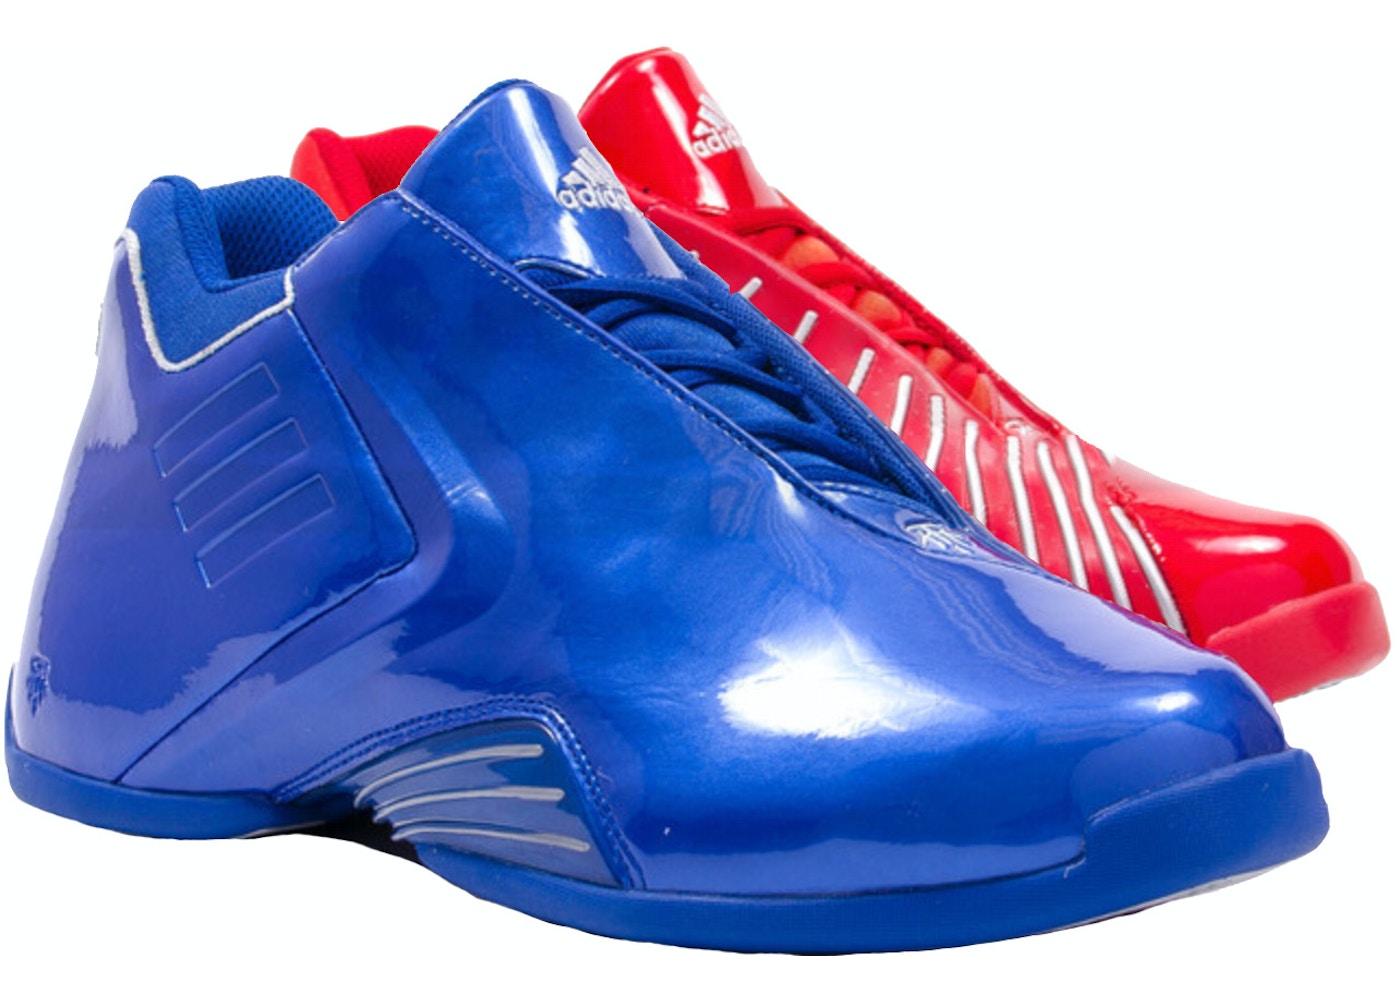 huge discount c645b 4d864 adidas TMAC 3 Packer Shoes